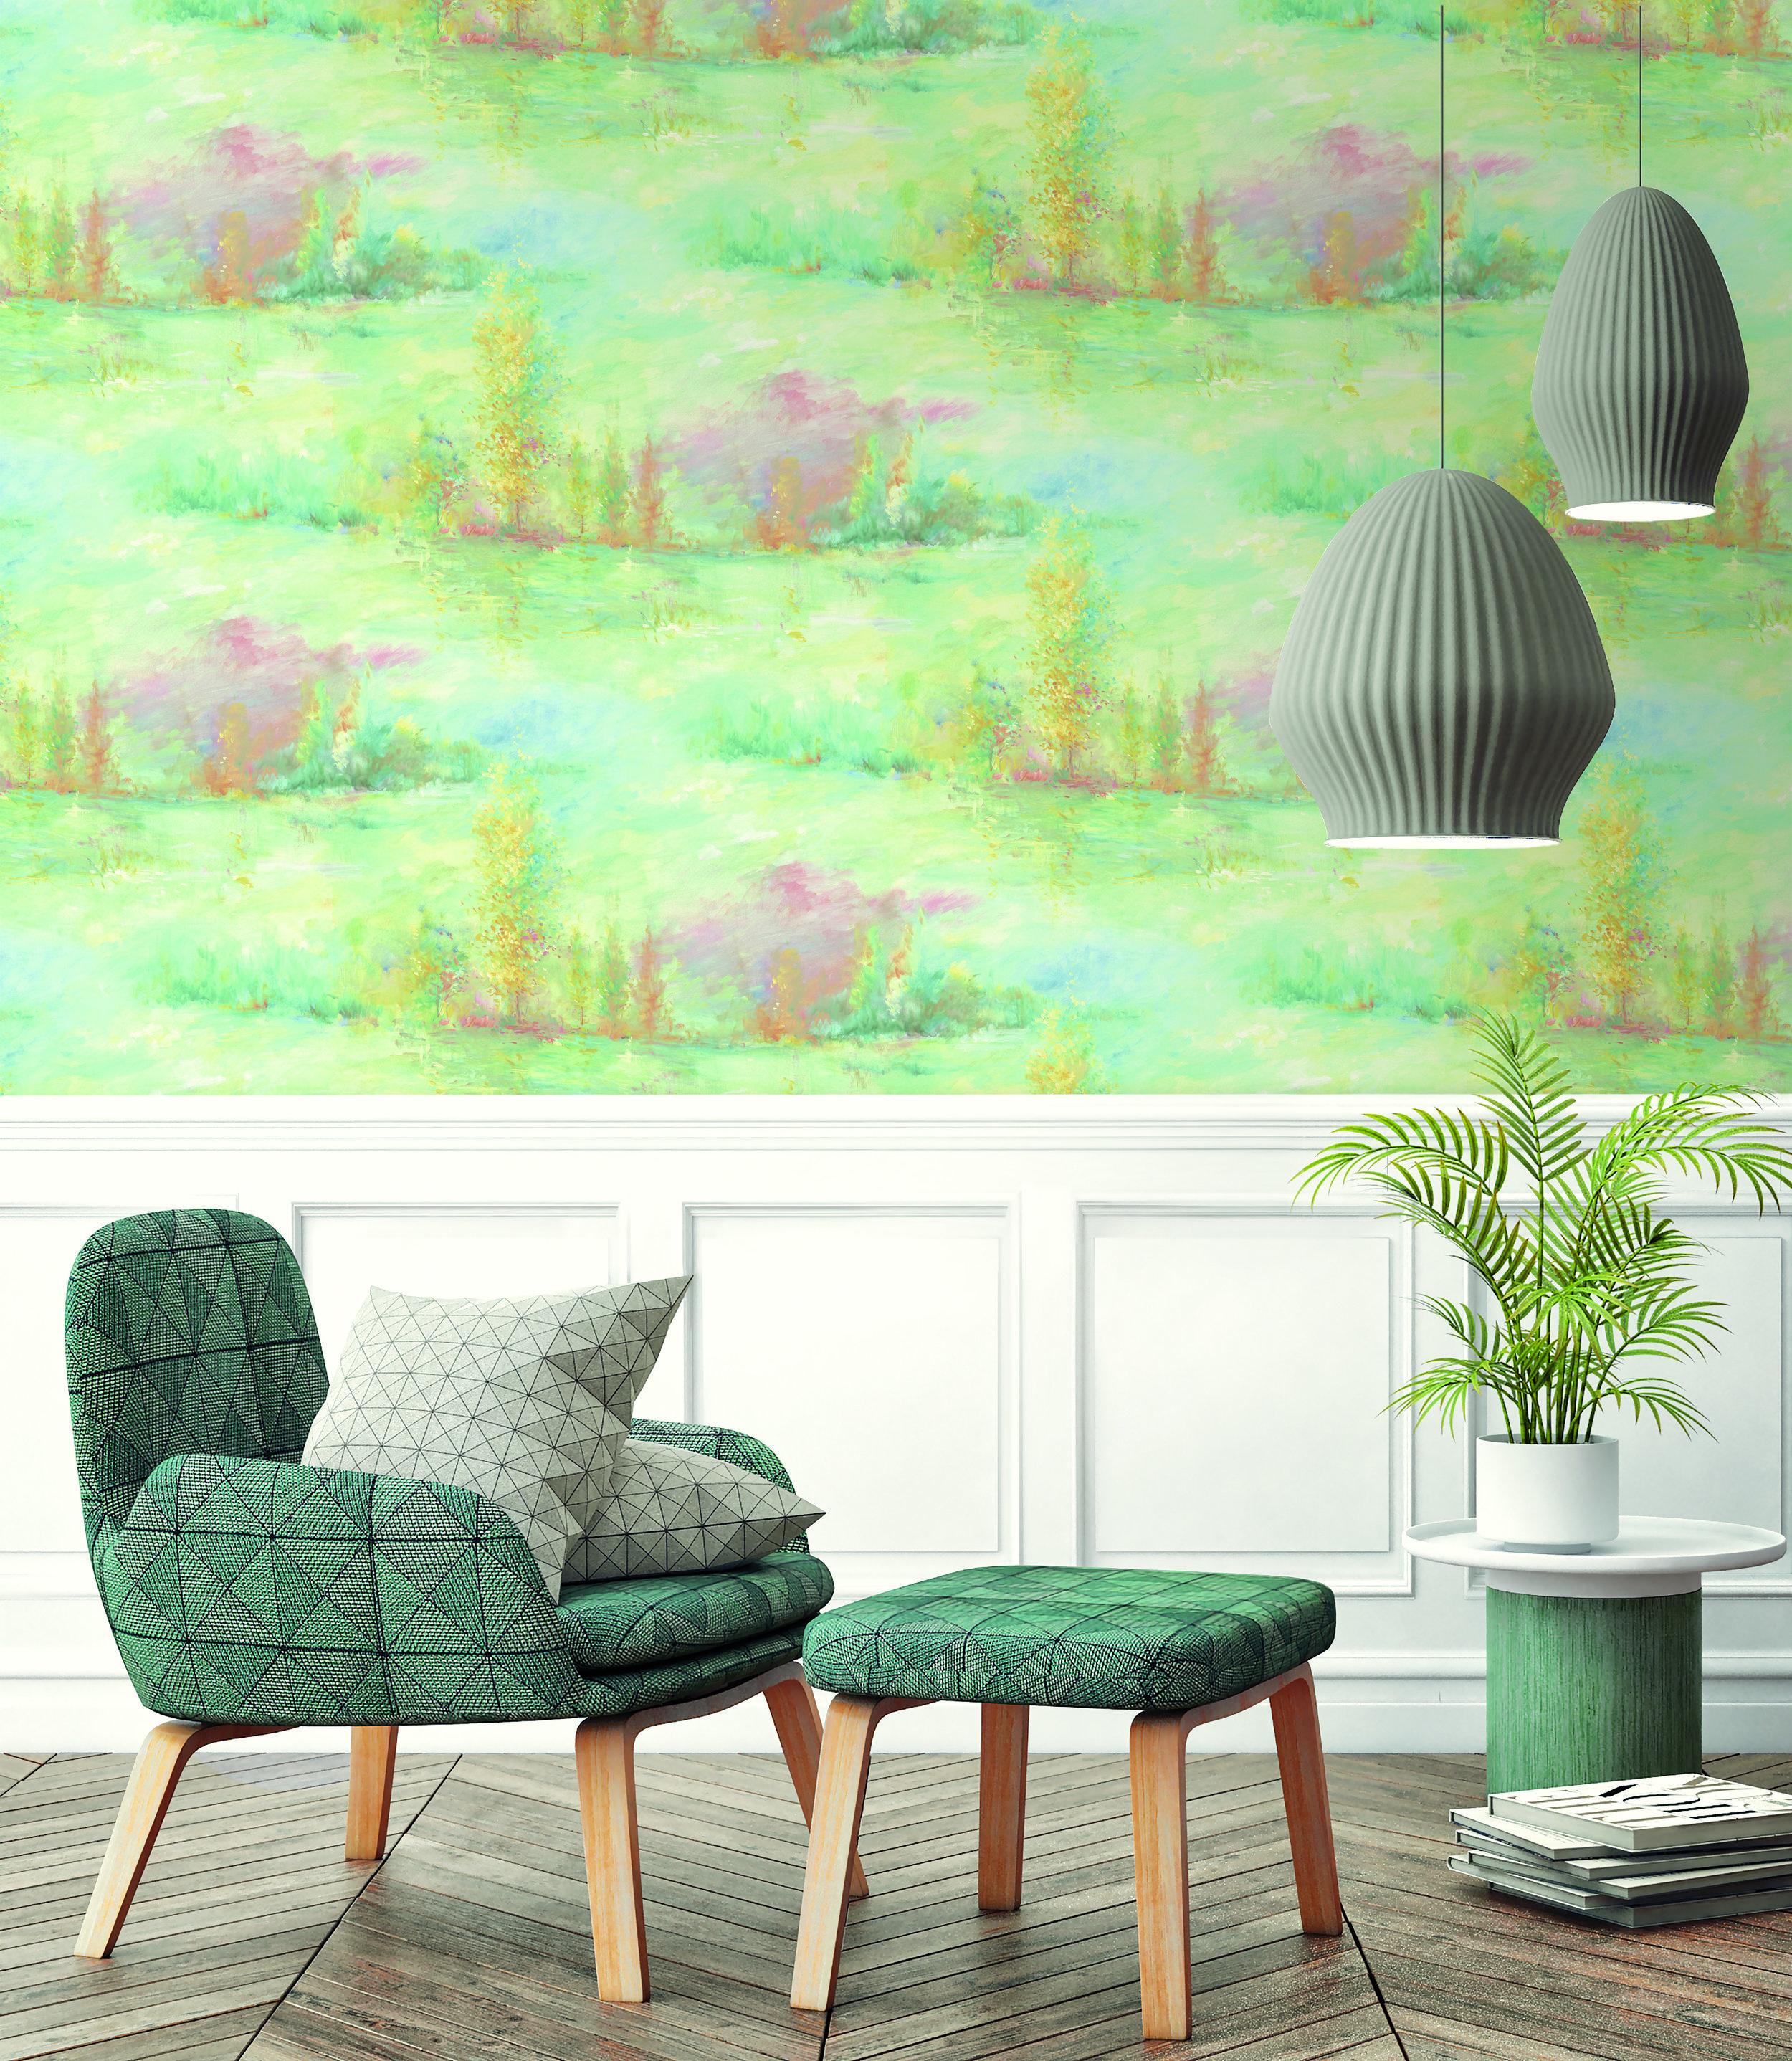 Resene green 1B-FI70814 wallpaper from  Resene ColorShops.